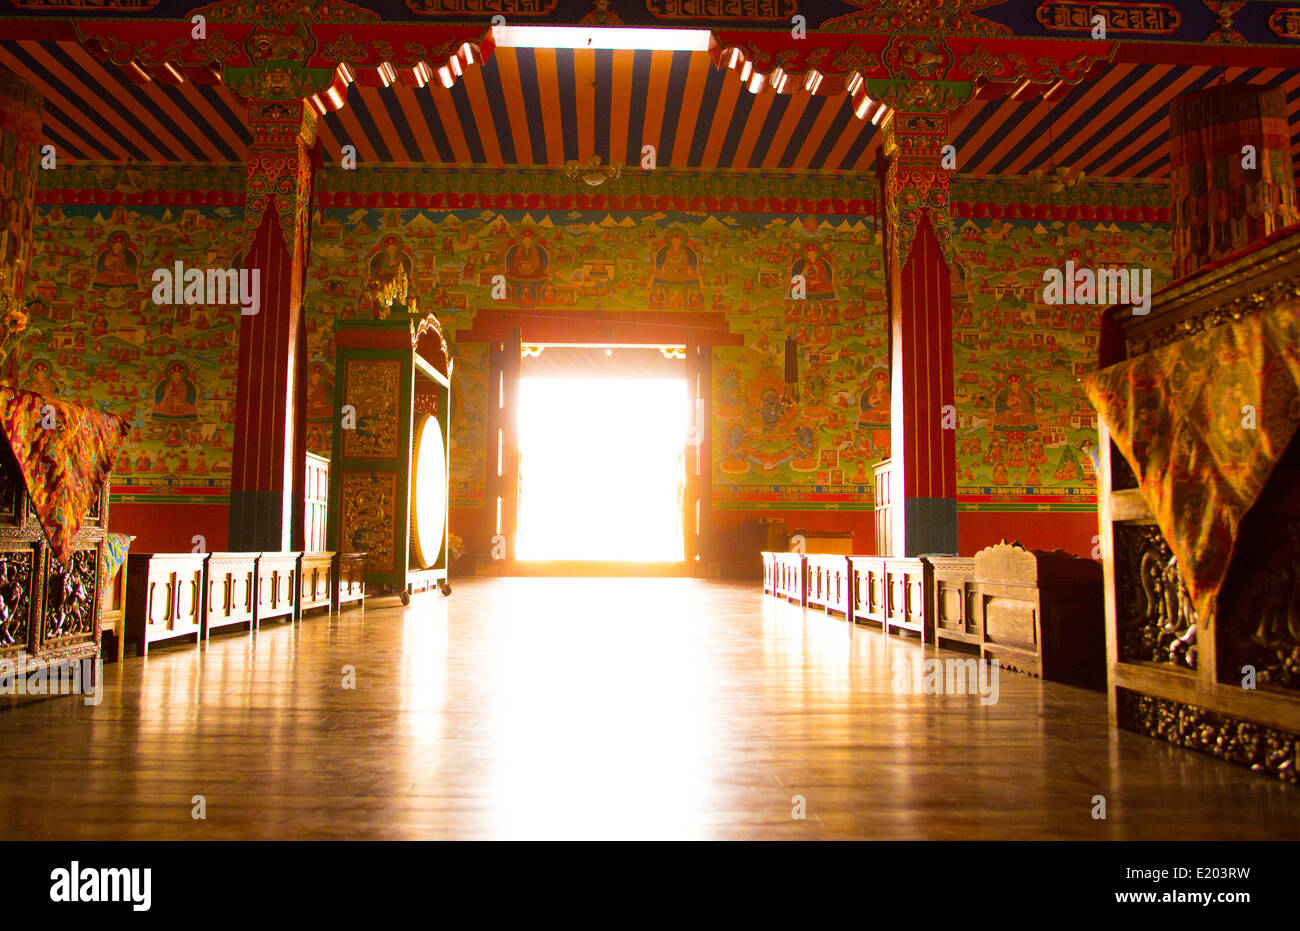 Kathmandu Nepal The main entrance to the prayer hall at the Drikung Kagyu Rinchenling monastery Eastern Kathmandu - Stock Image